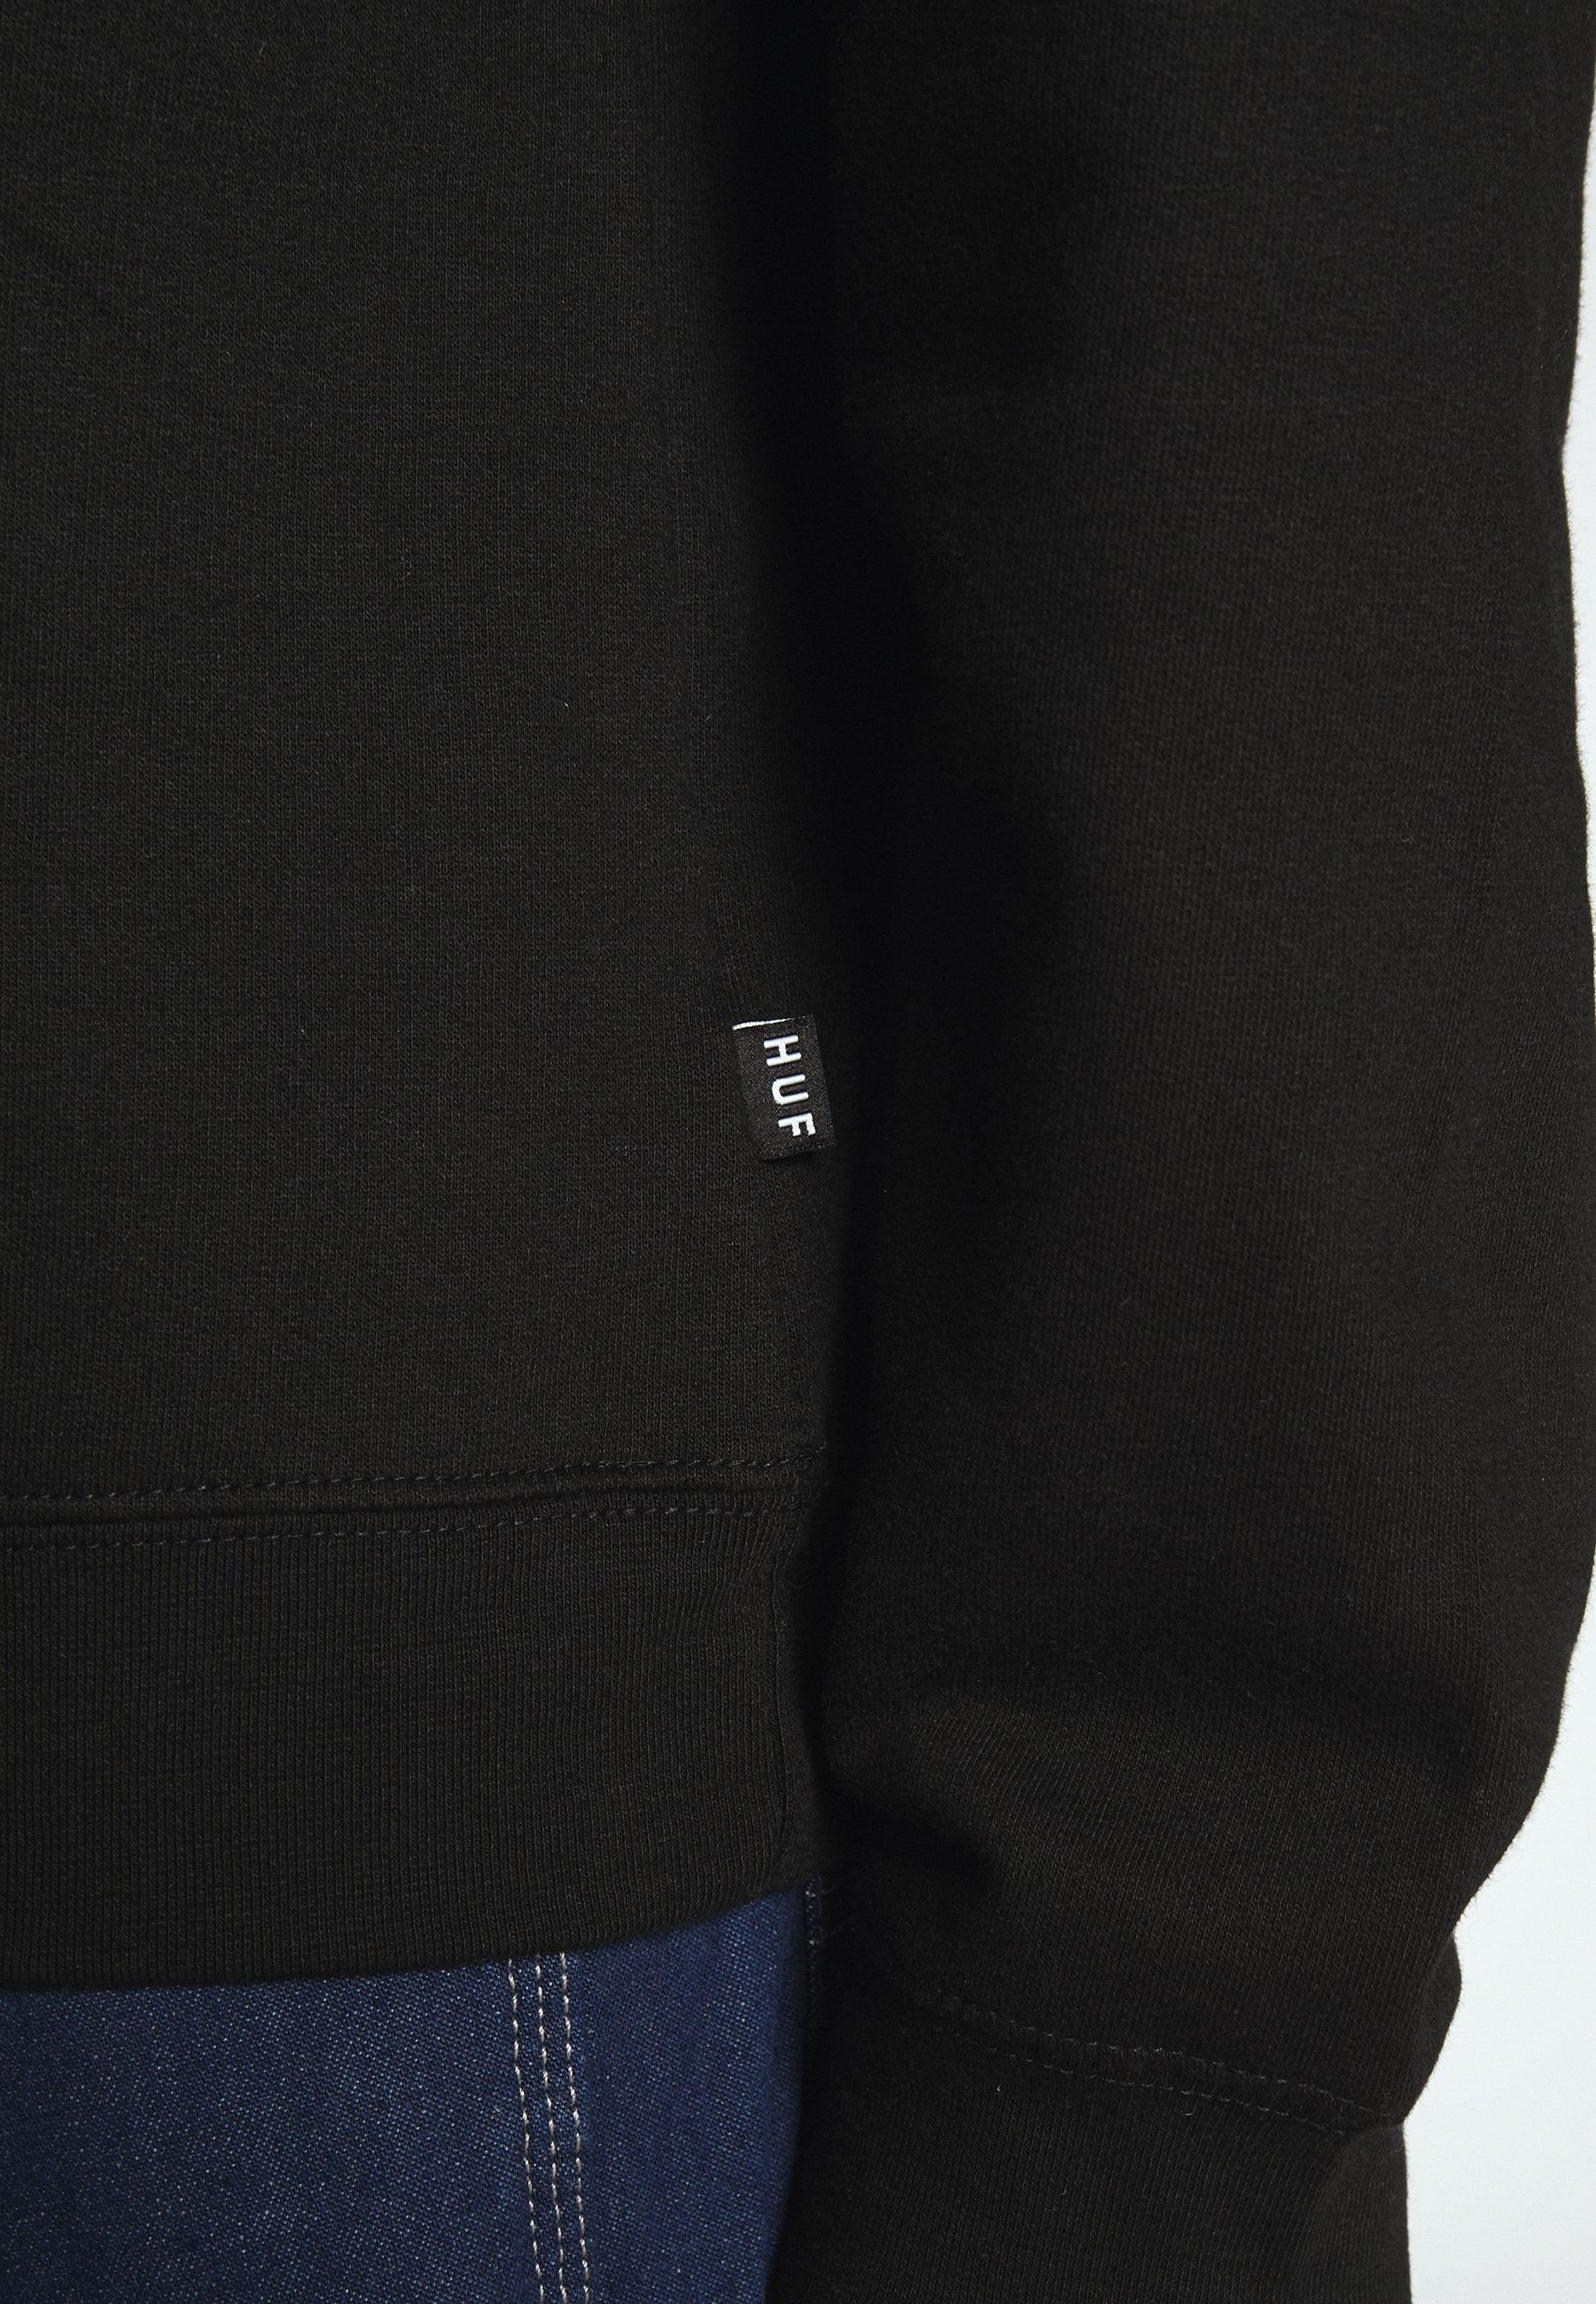 Huf Year Of The Rat Crewneck - Sweatshirt Black